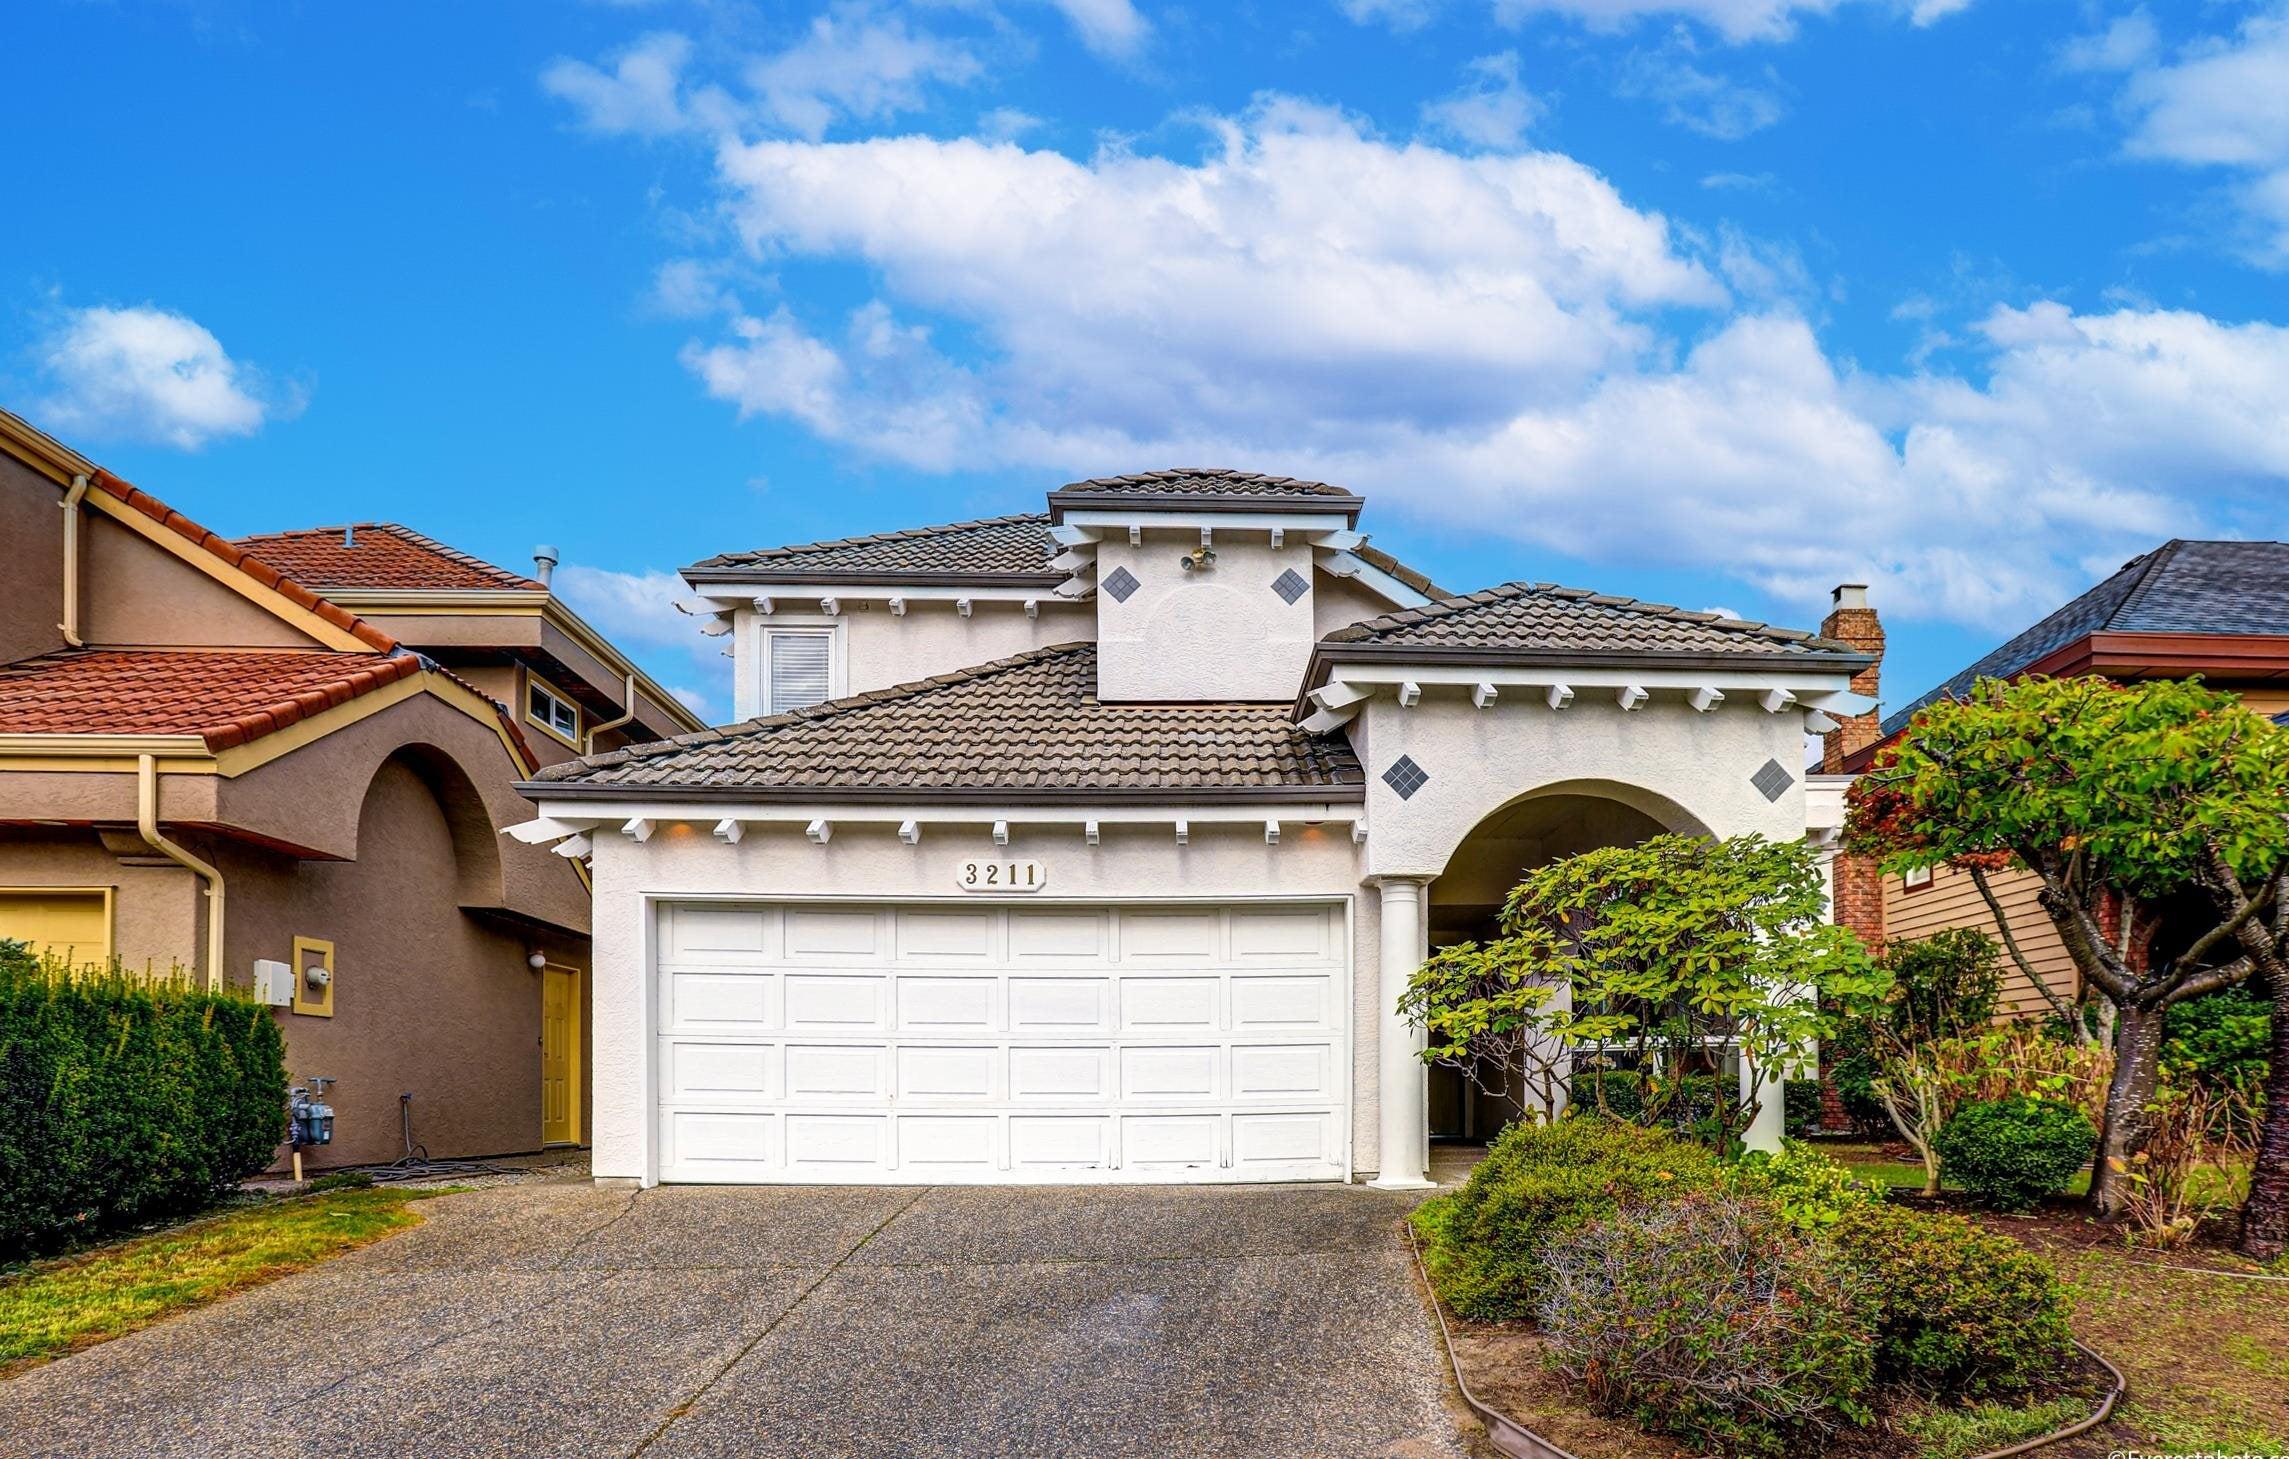 3211 WESTMINSTER HIGHWAY - Terra Nova House/Single Family for sale, 6 Bedrooms (R2624447)